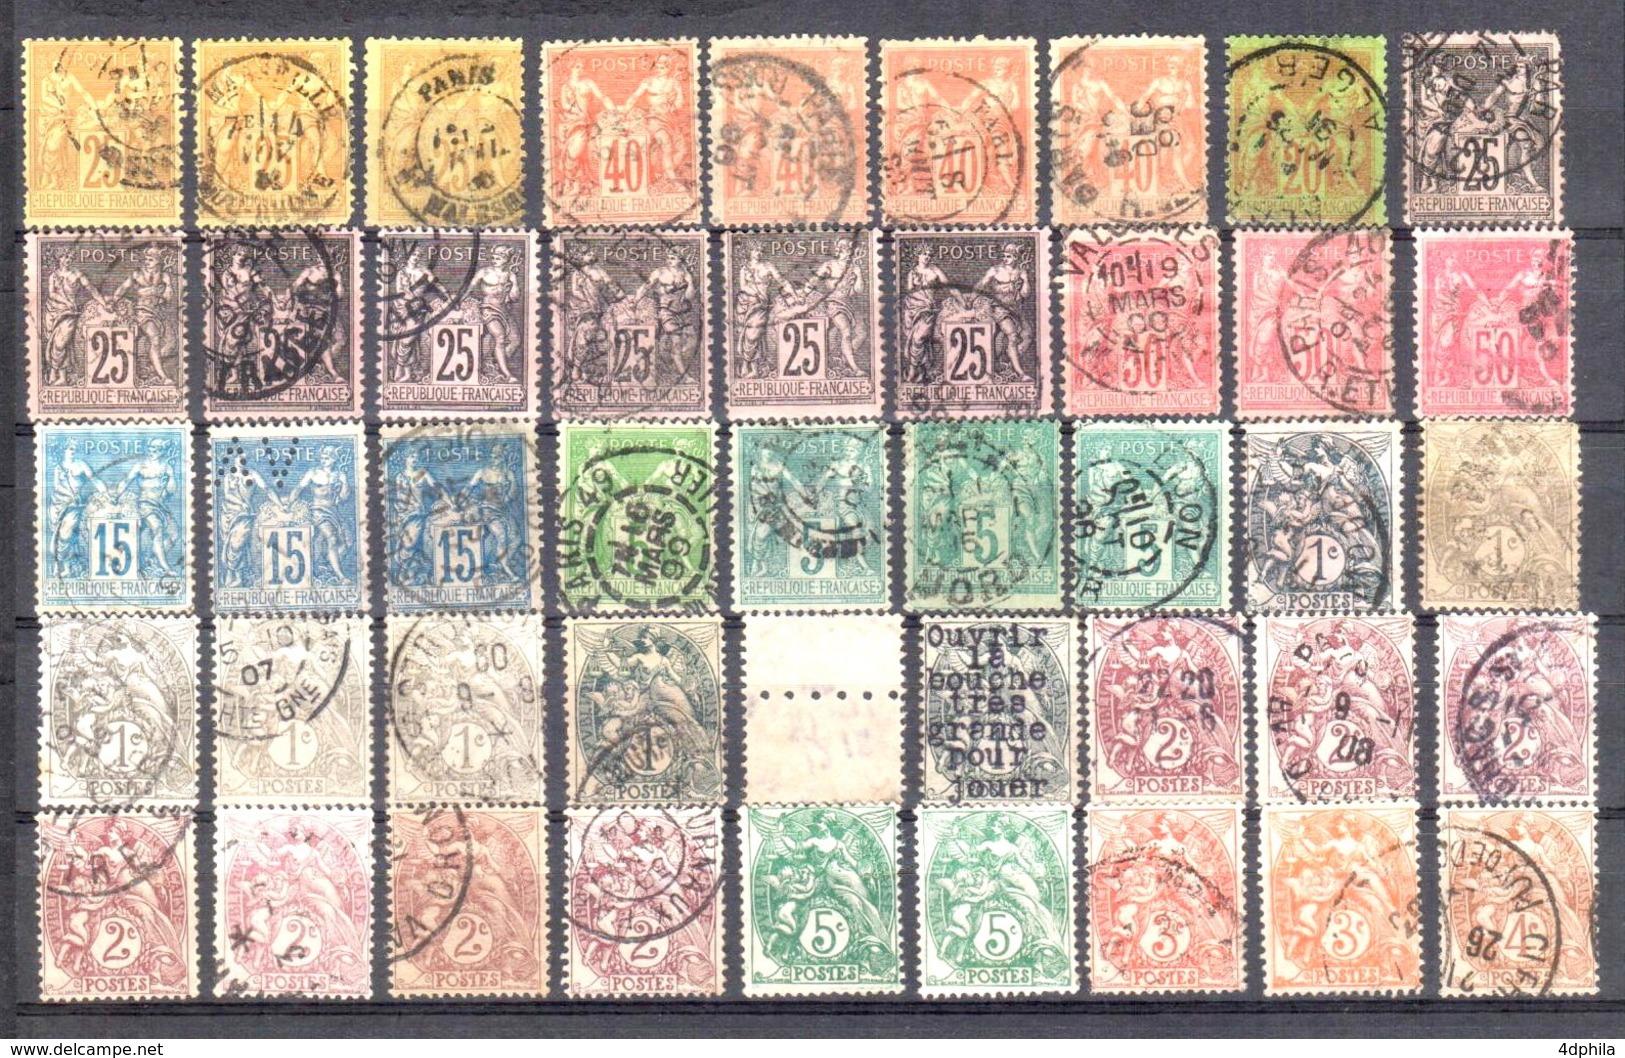 France - Collection 259 Timbres Dès 1853, Forte Cote - France